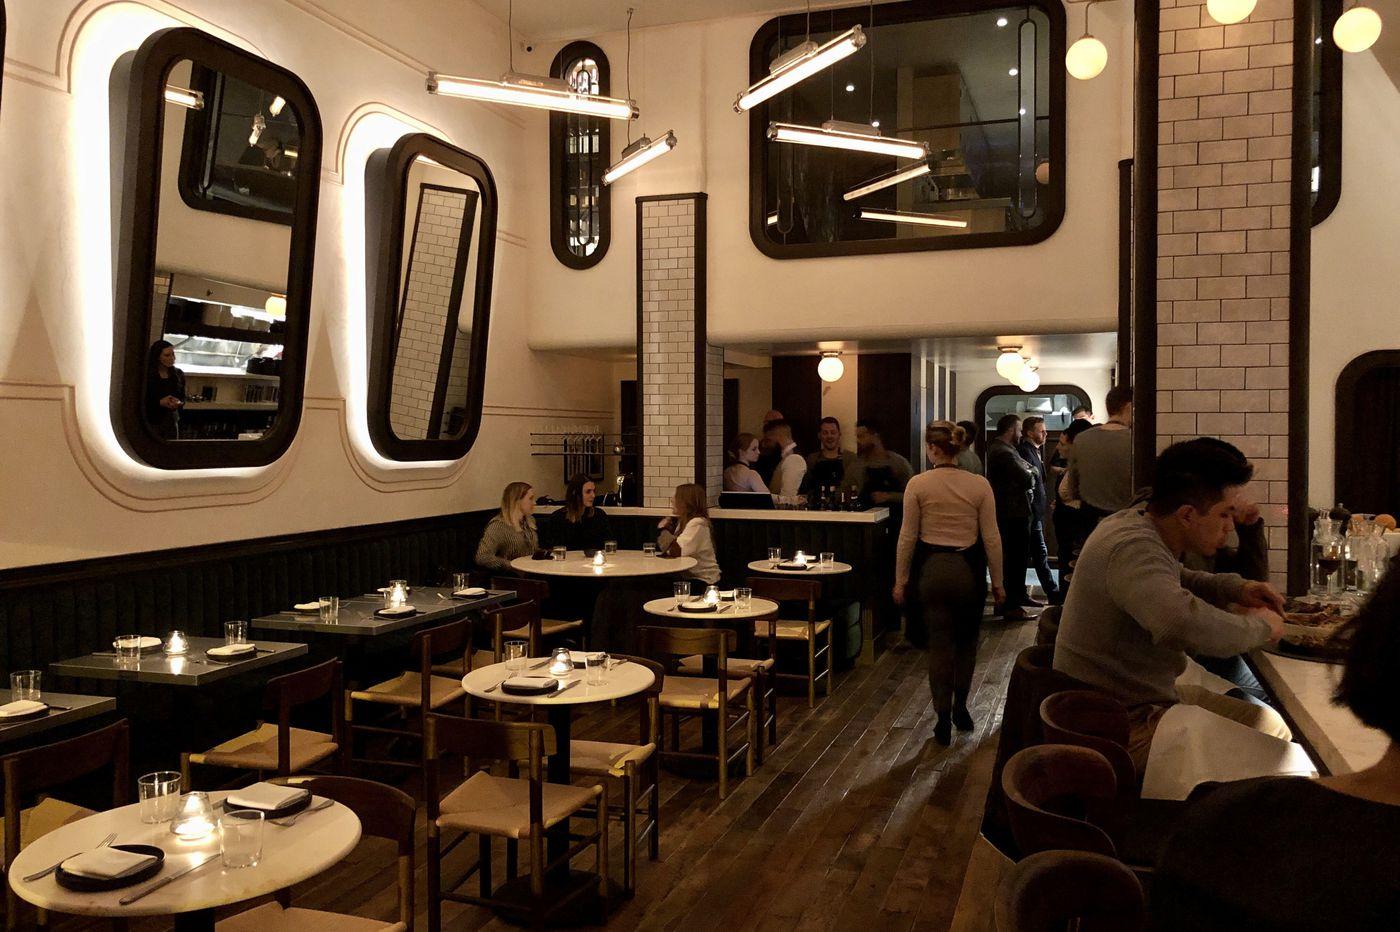 Via Locusta: Stylish pasta off Rittenhouse Square | Let's Eat